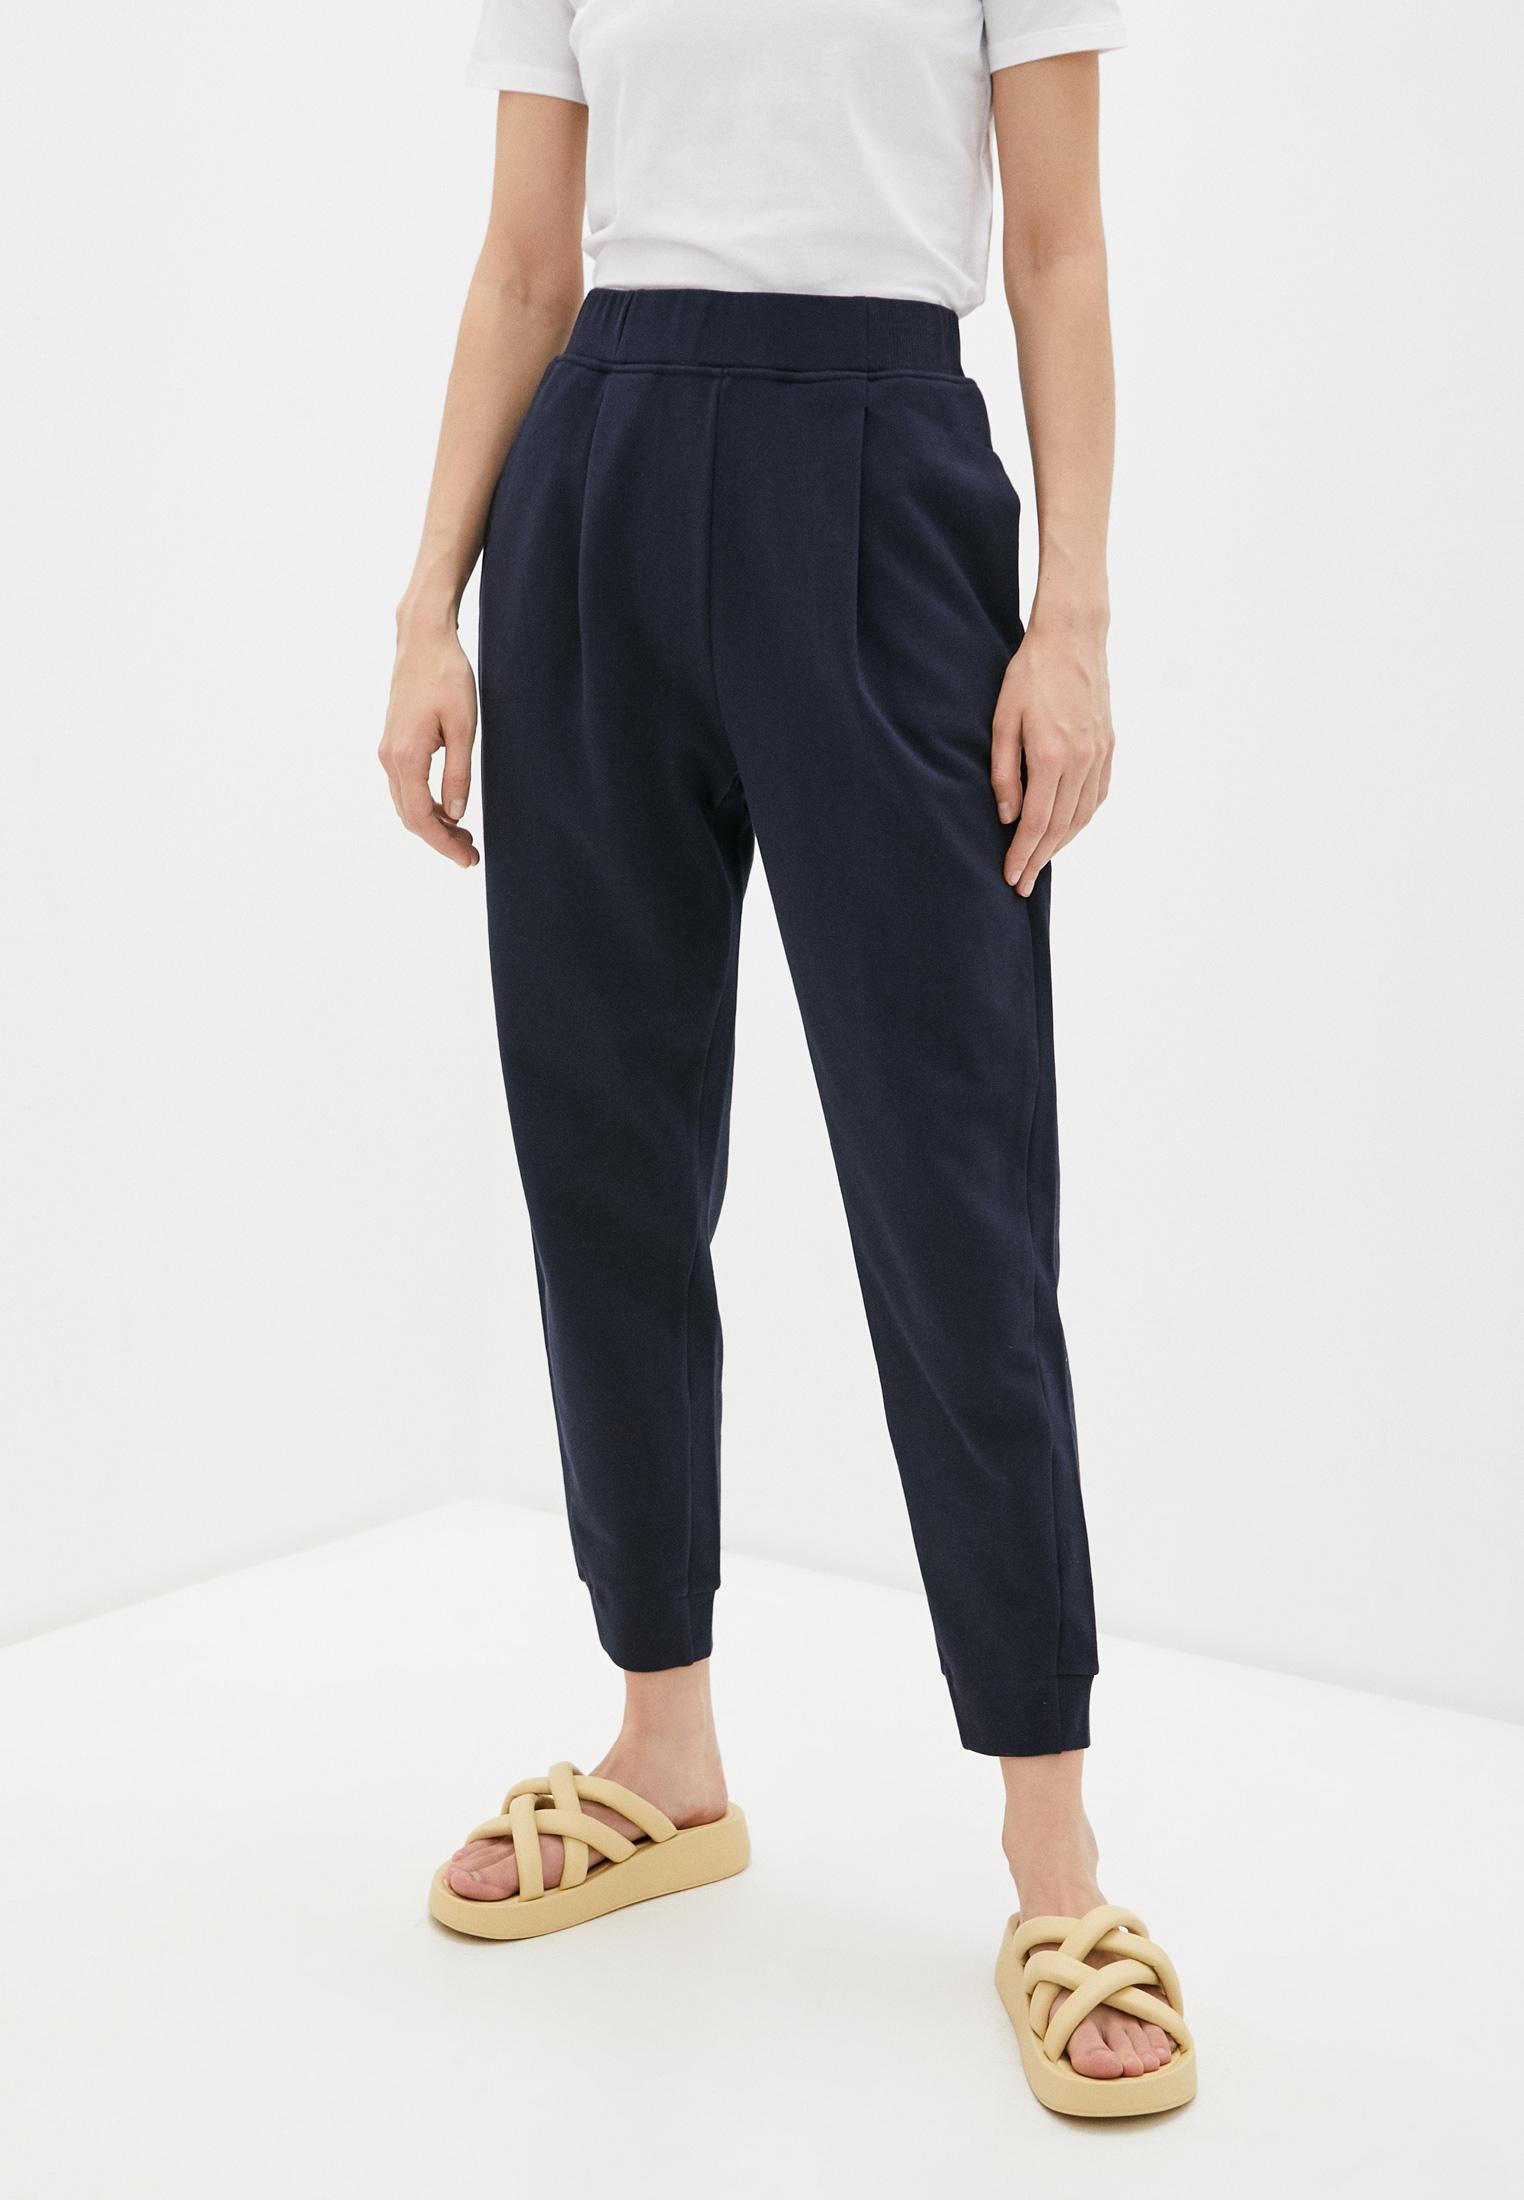 Женские спортивные брюки Max Mara Leisure 37810816600